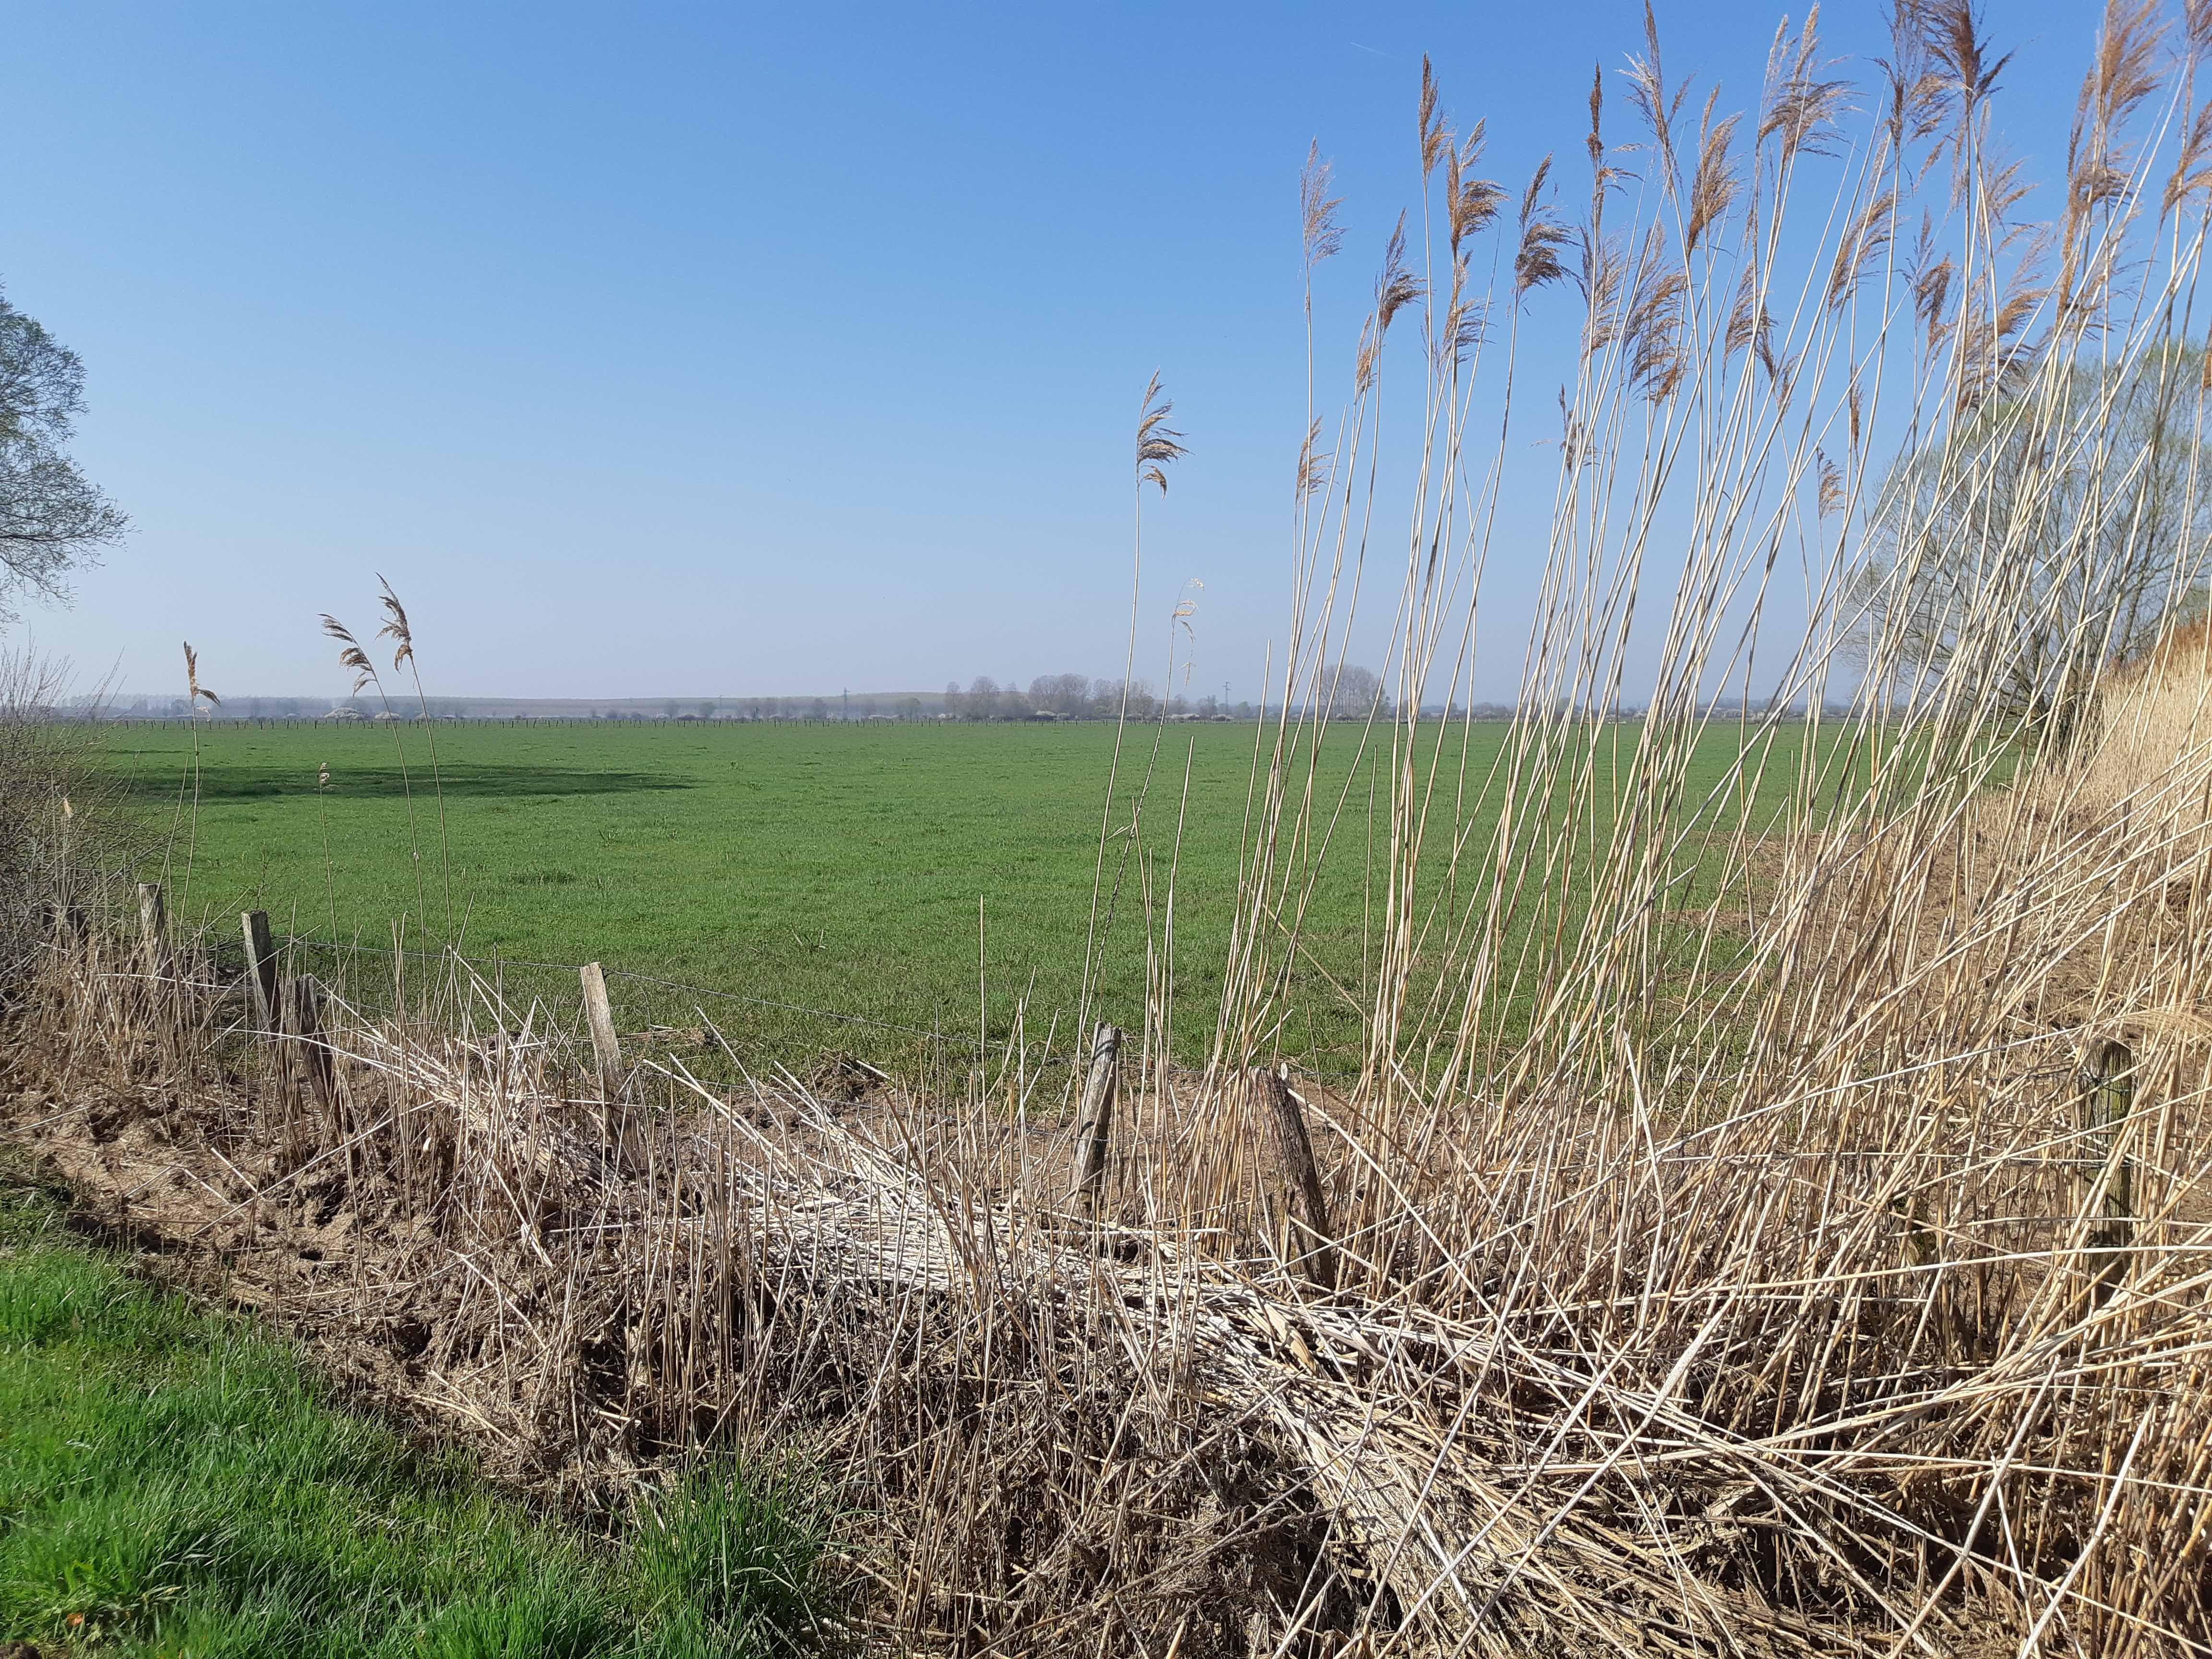 Nom : prairie sèchée.jpg Affichages : 746 Taille : 1,75 Mo